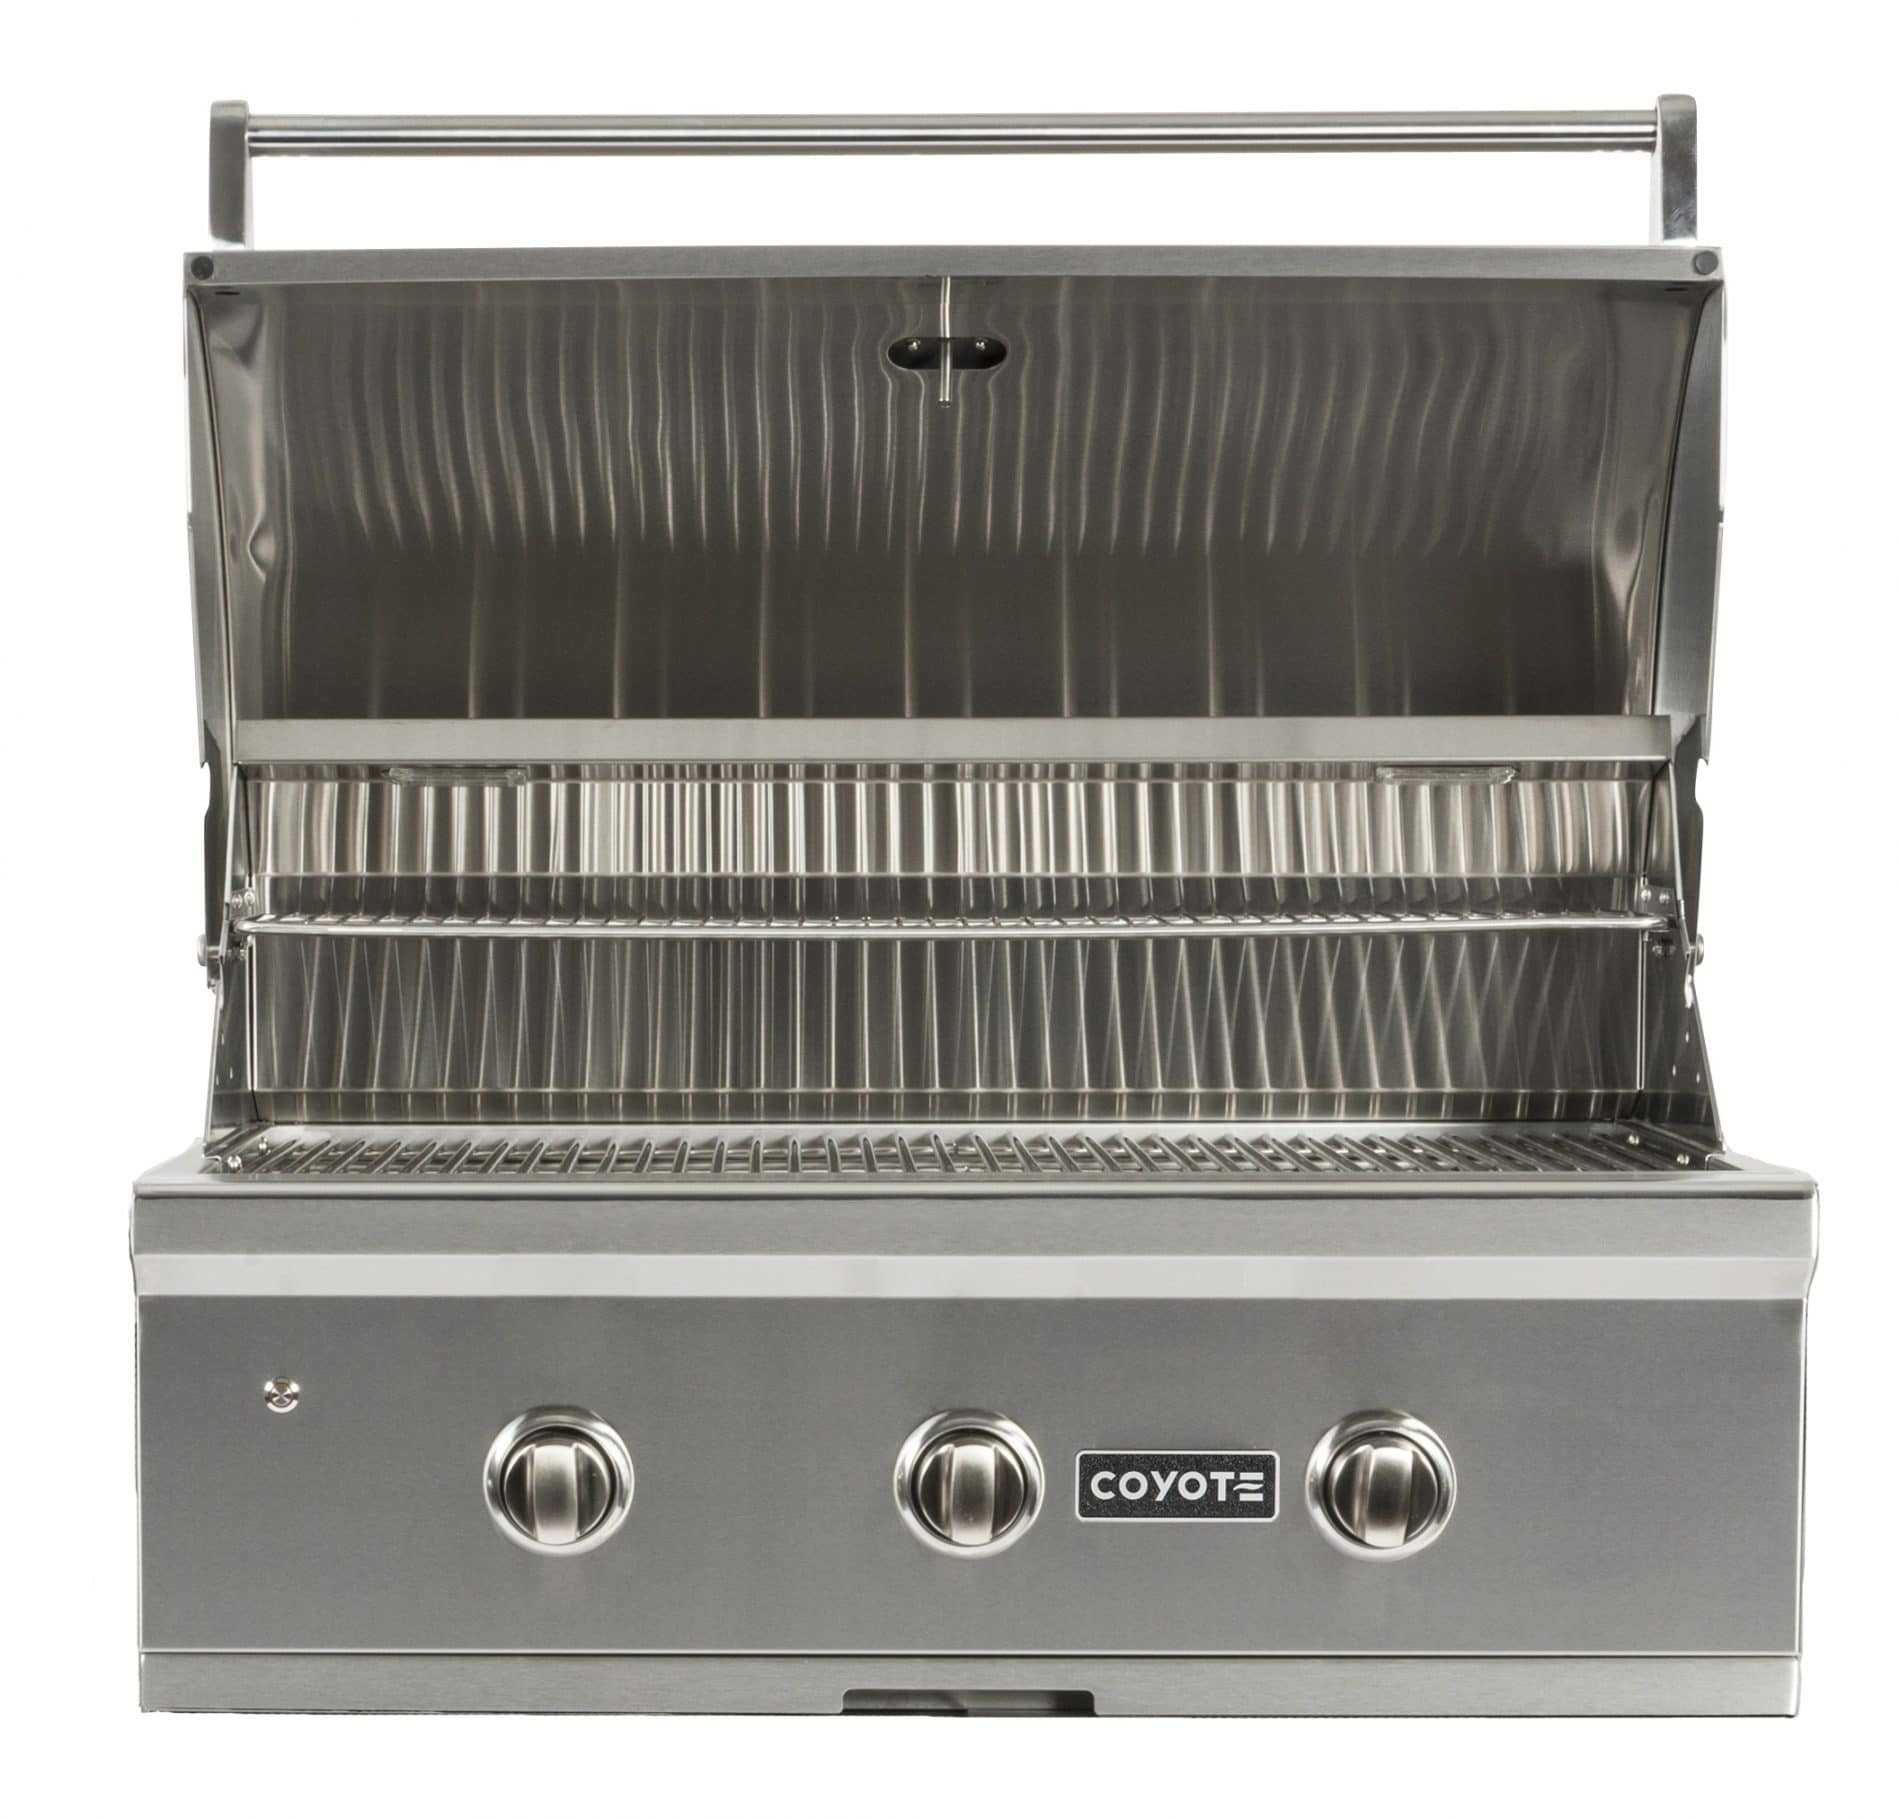 "ARCHIVED/OLDER MODEL: 34"" C-Series Grill (Model: C1C34 NG/LP)"